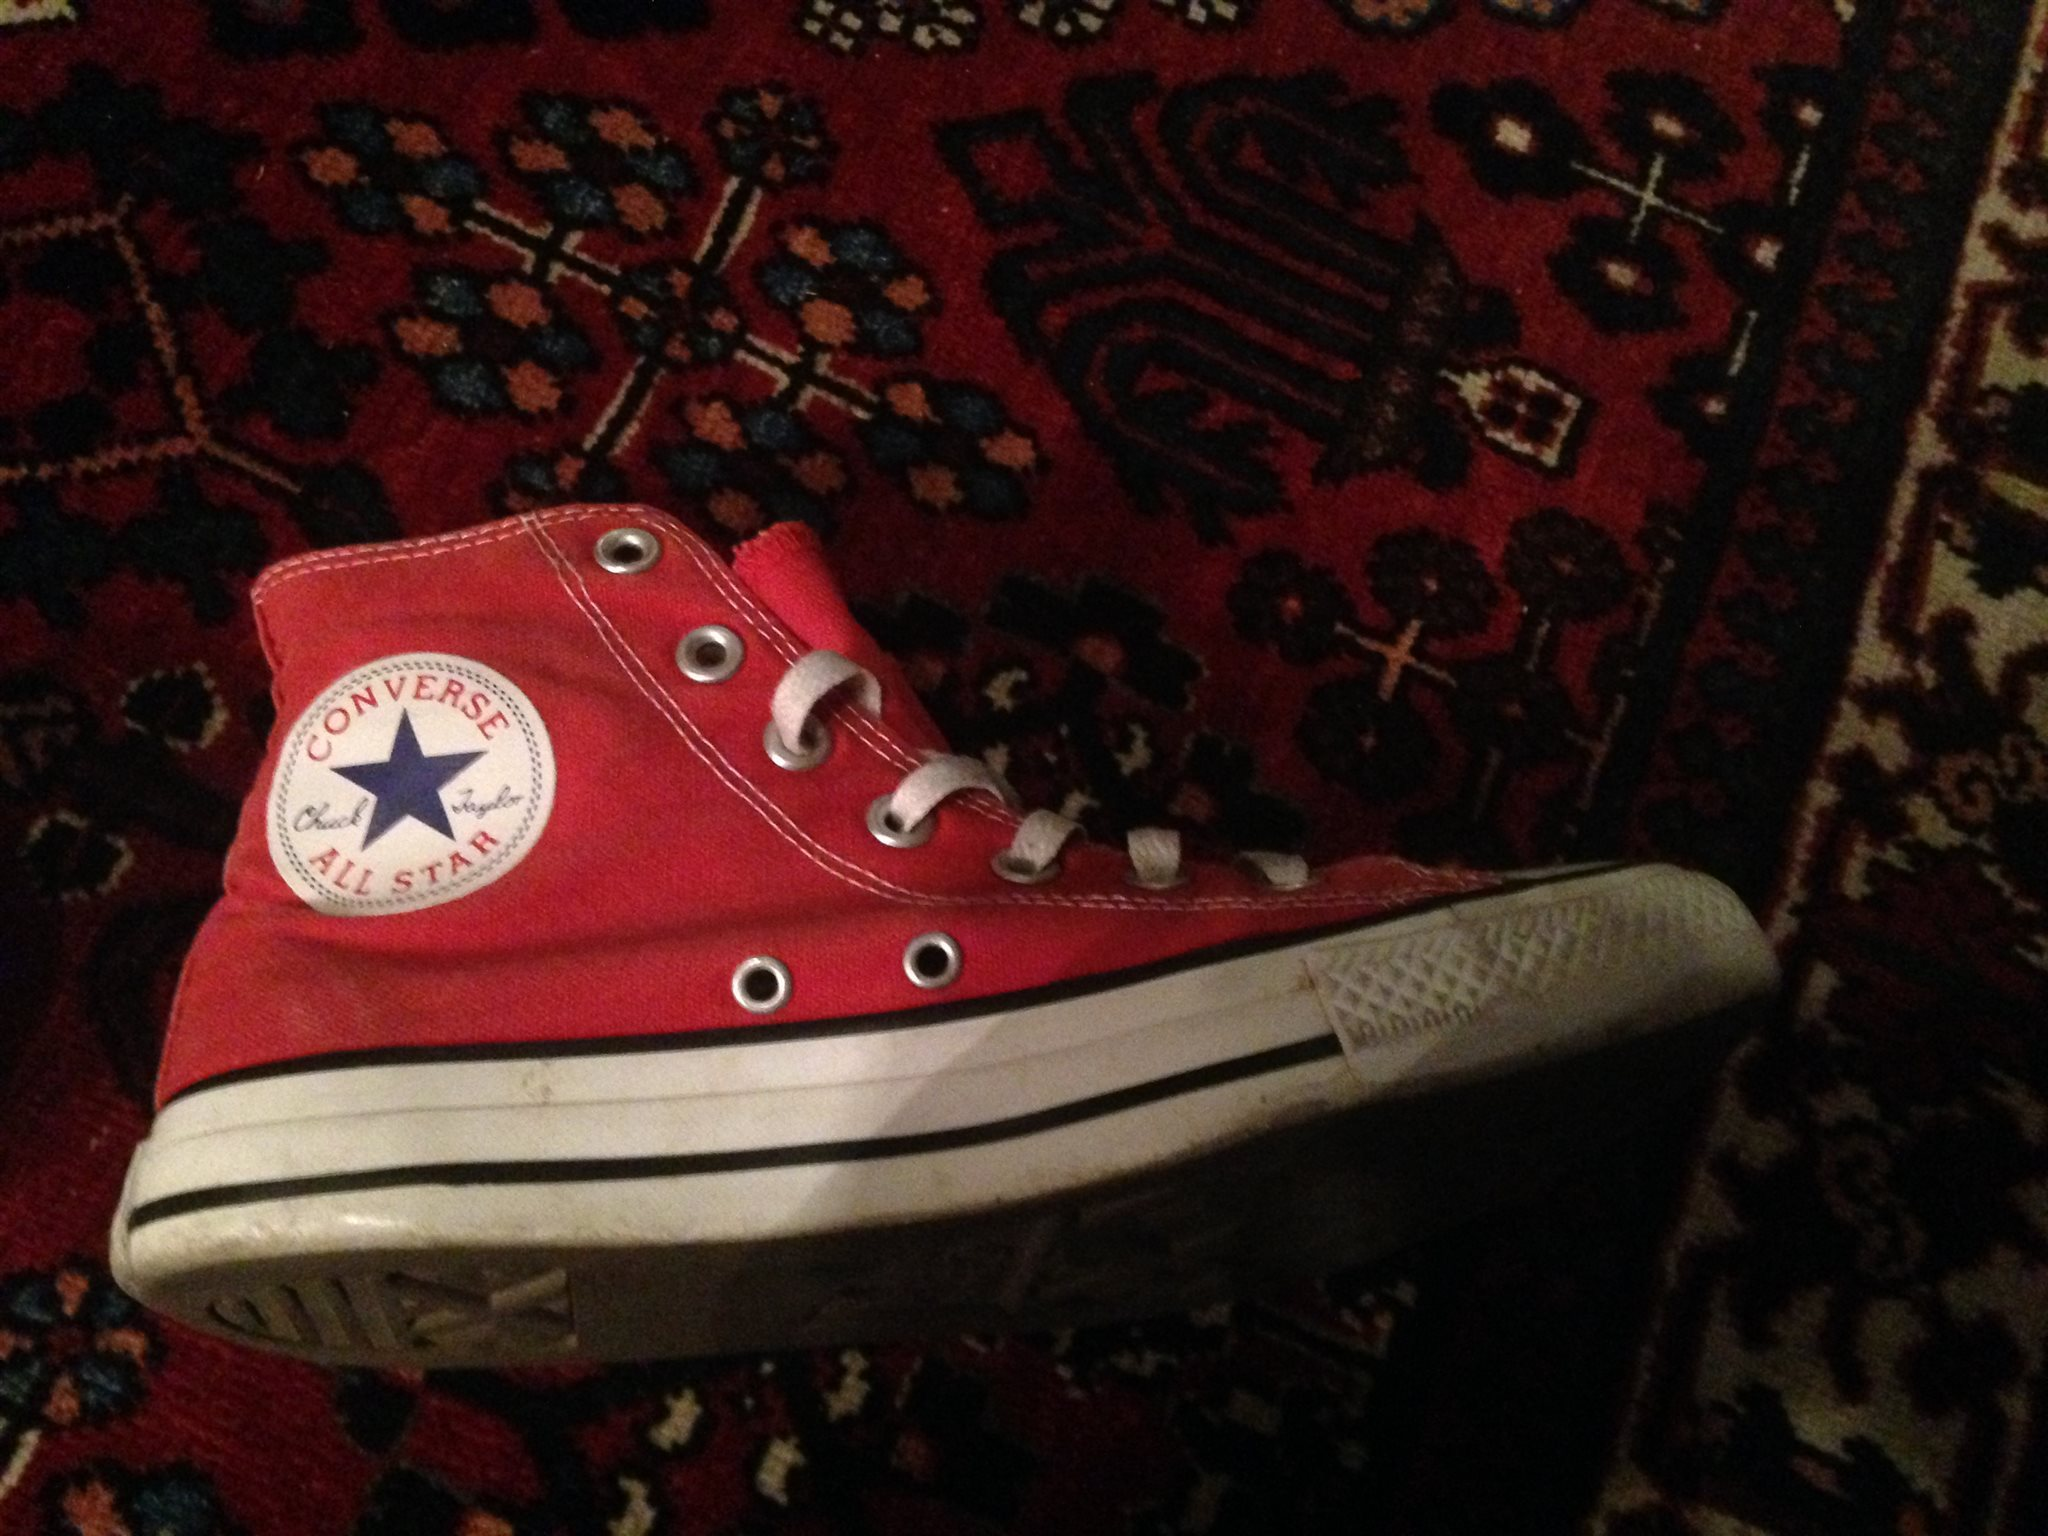 24931765c19 Röda Converse i storlek 38 (5,5) - Fint skick! (336941046) ᐈ Köp på ...